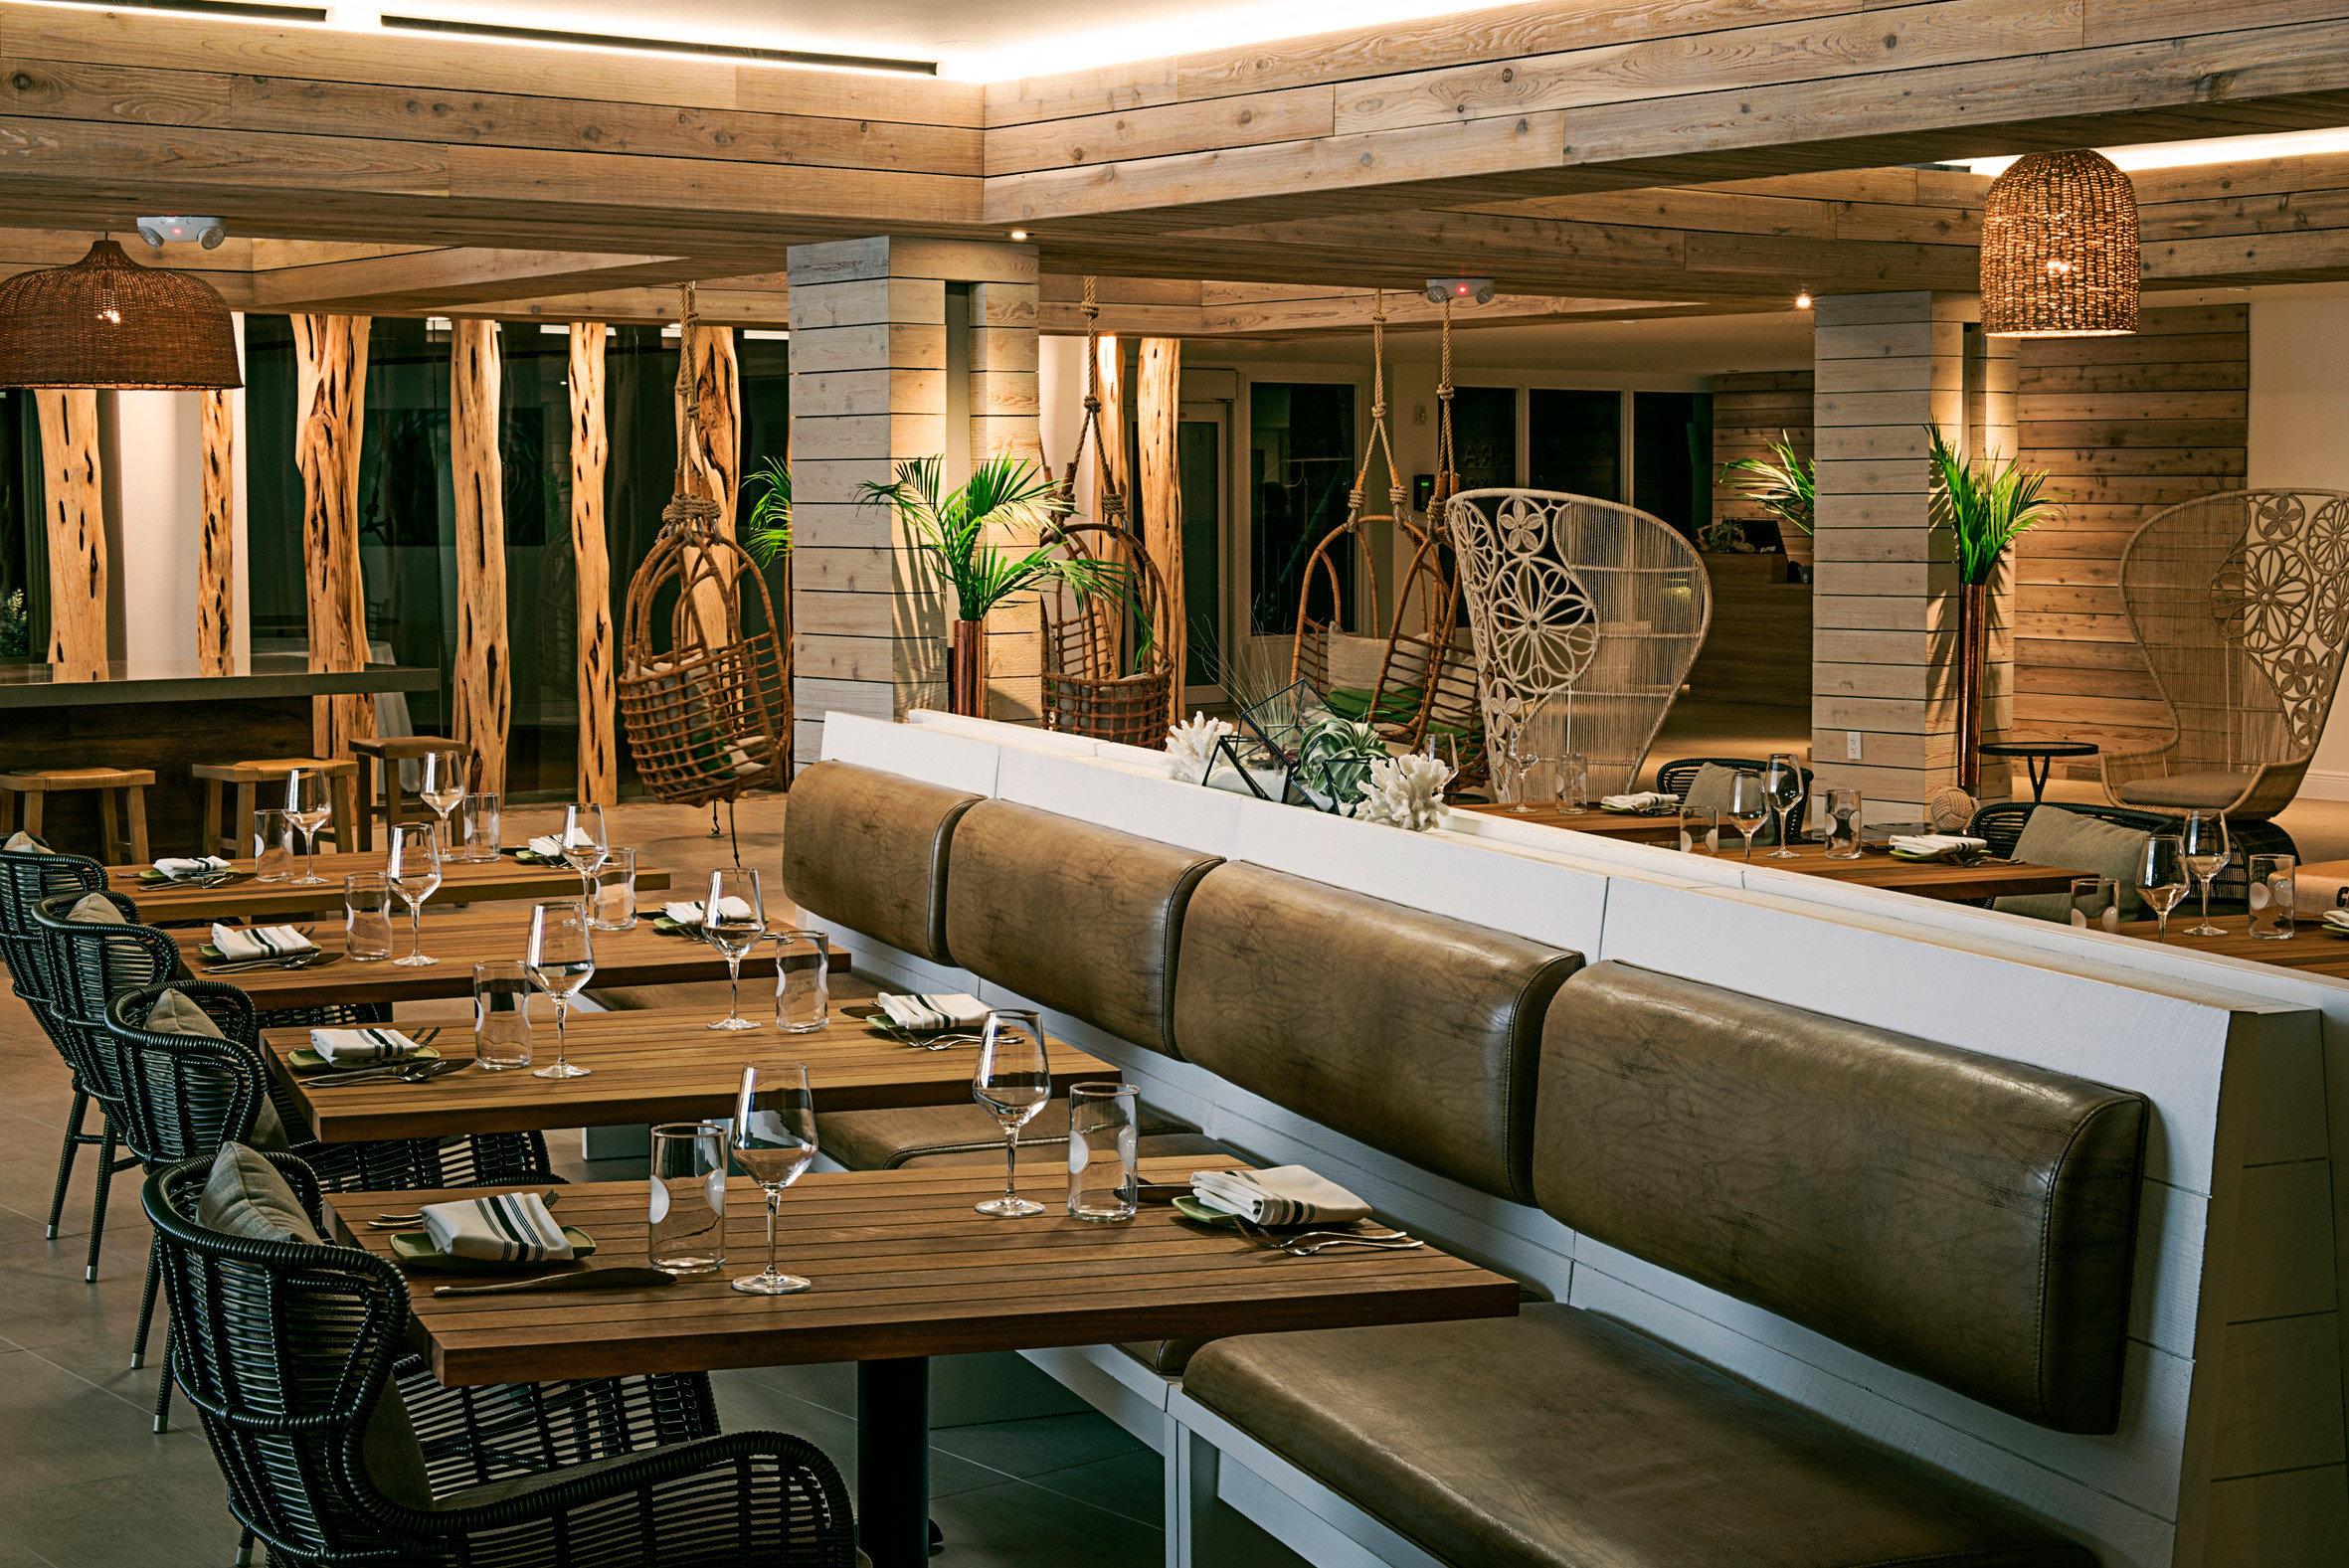 Beach Beachfront Dining Hotels Resort Romance room indoor restaurant estate interior design meal home Lobby Bar furniture area several